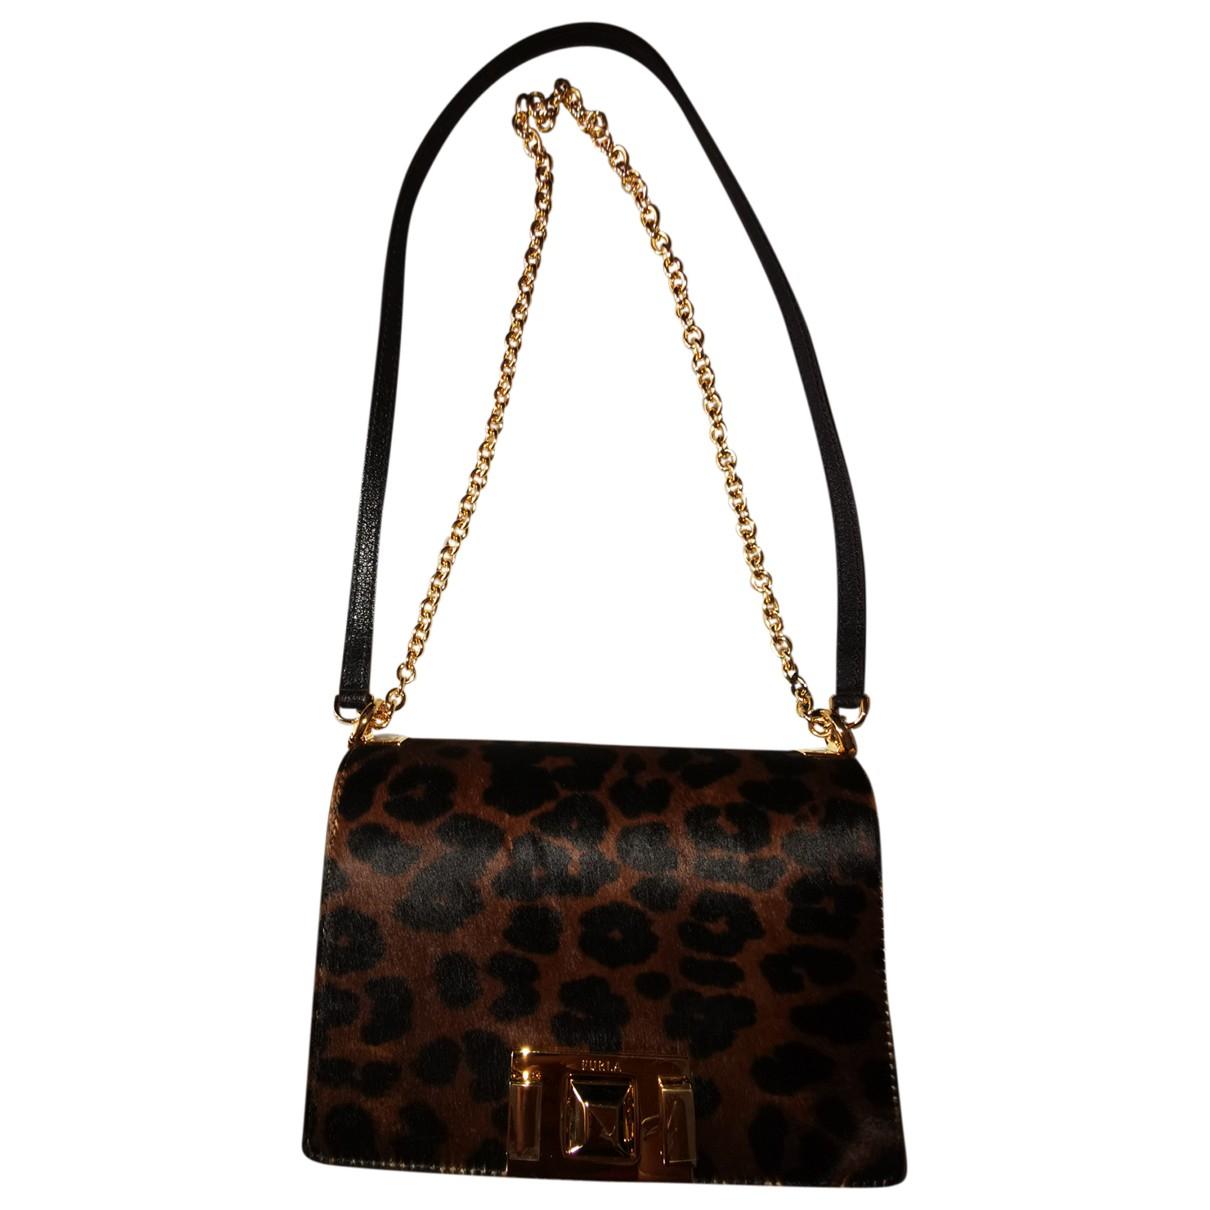 Furla N Black Leather handbag for Women N